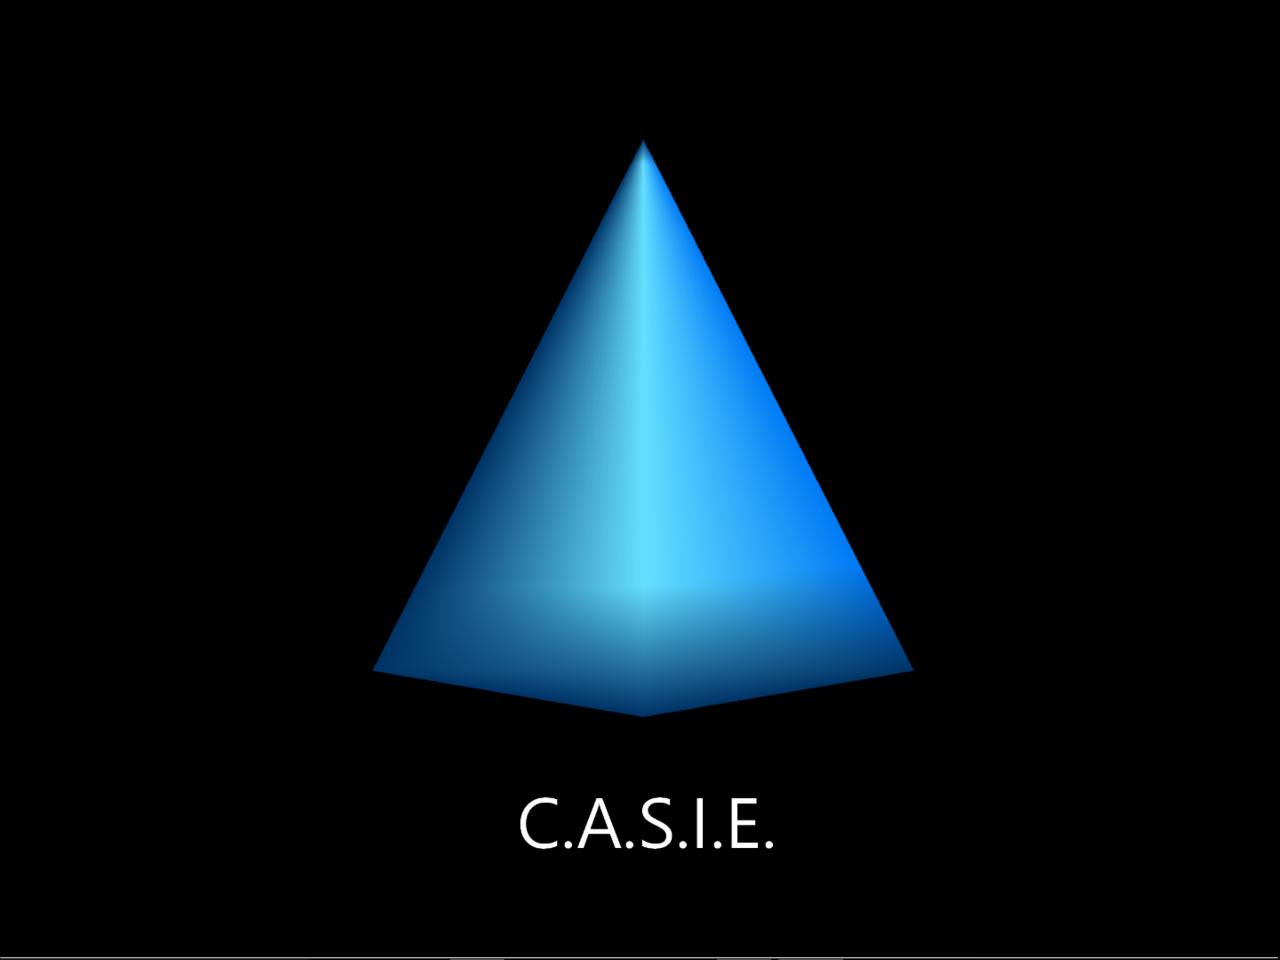 C.A.S.I.E